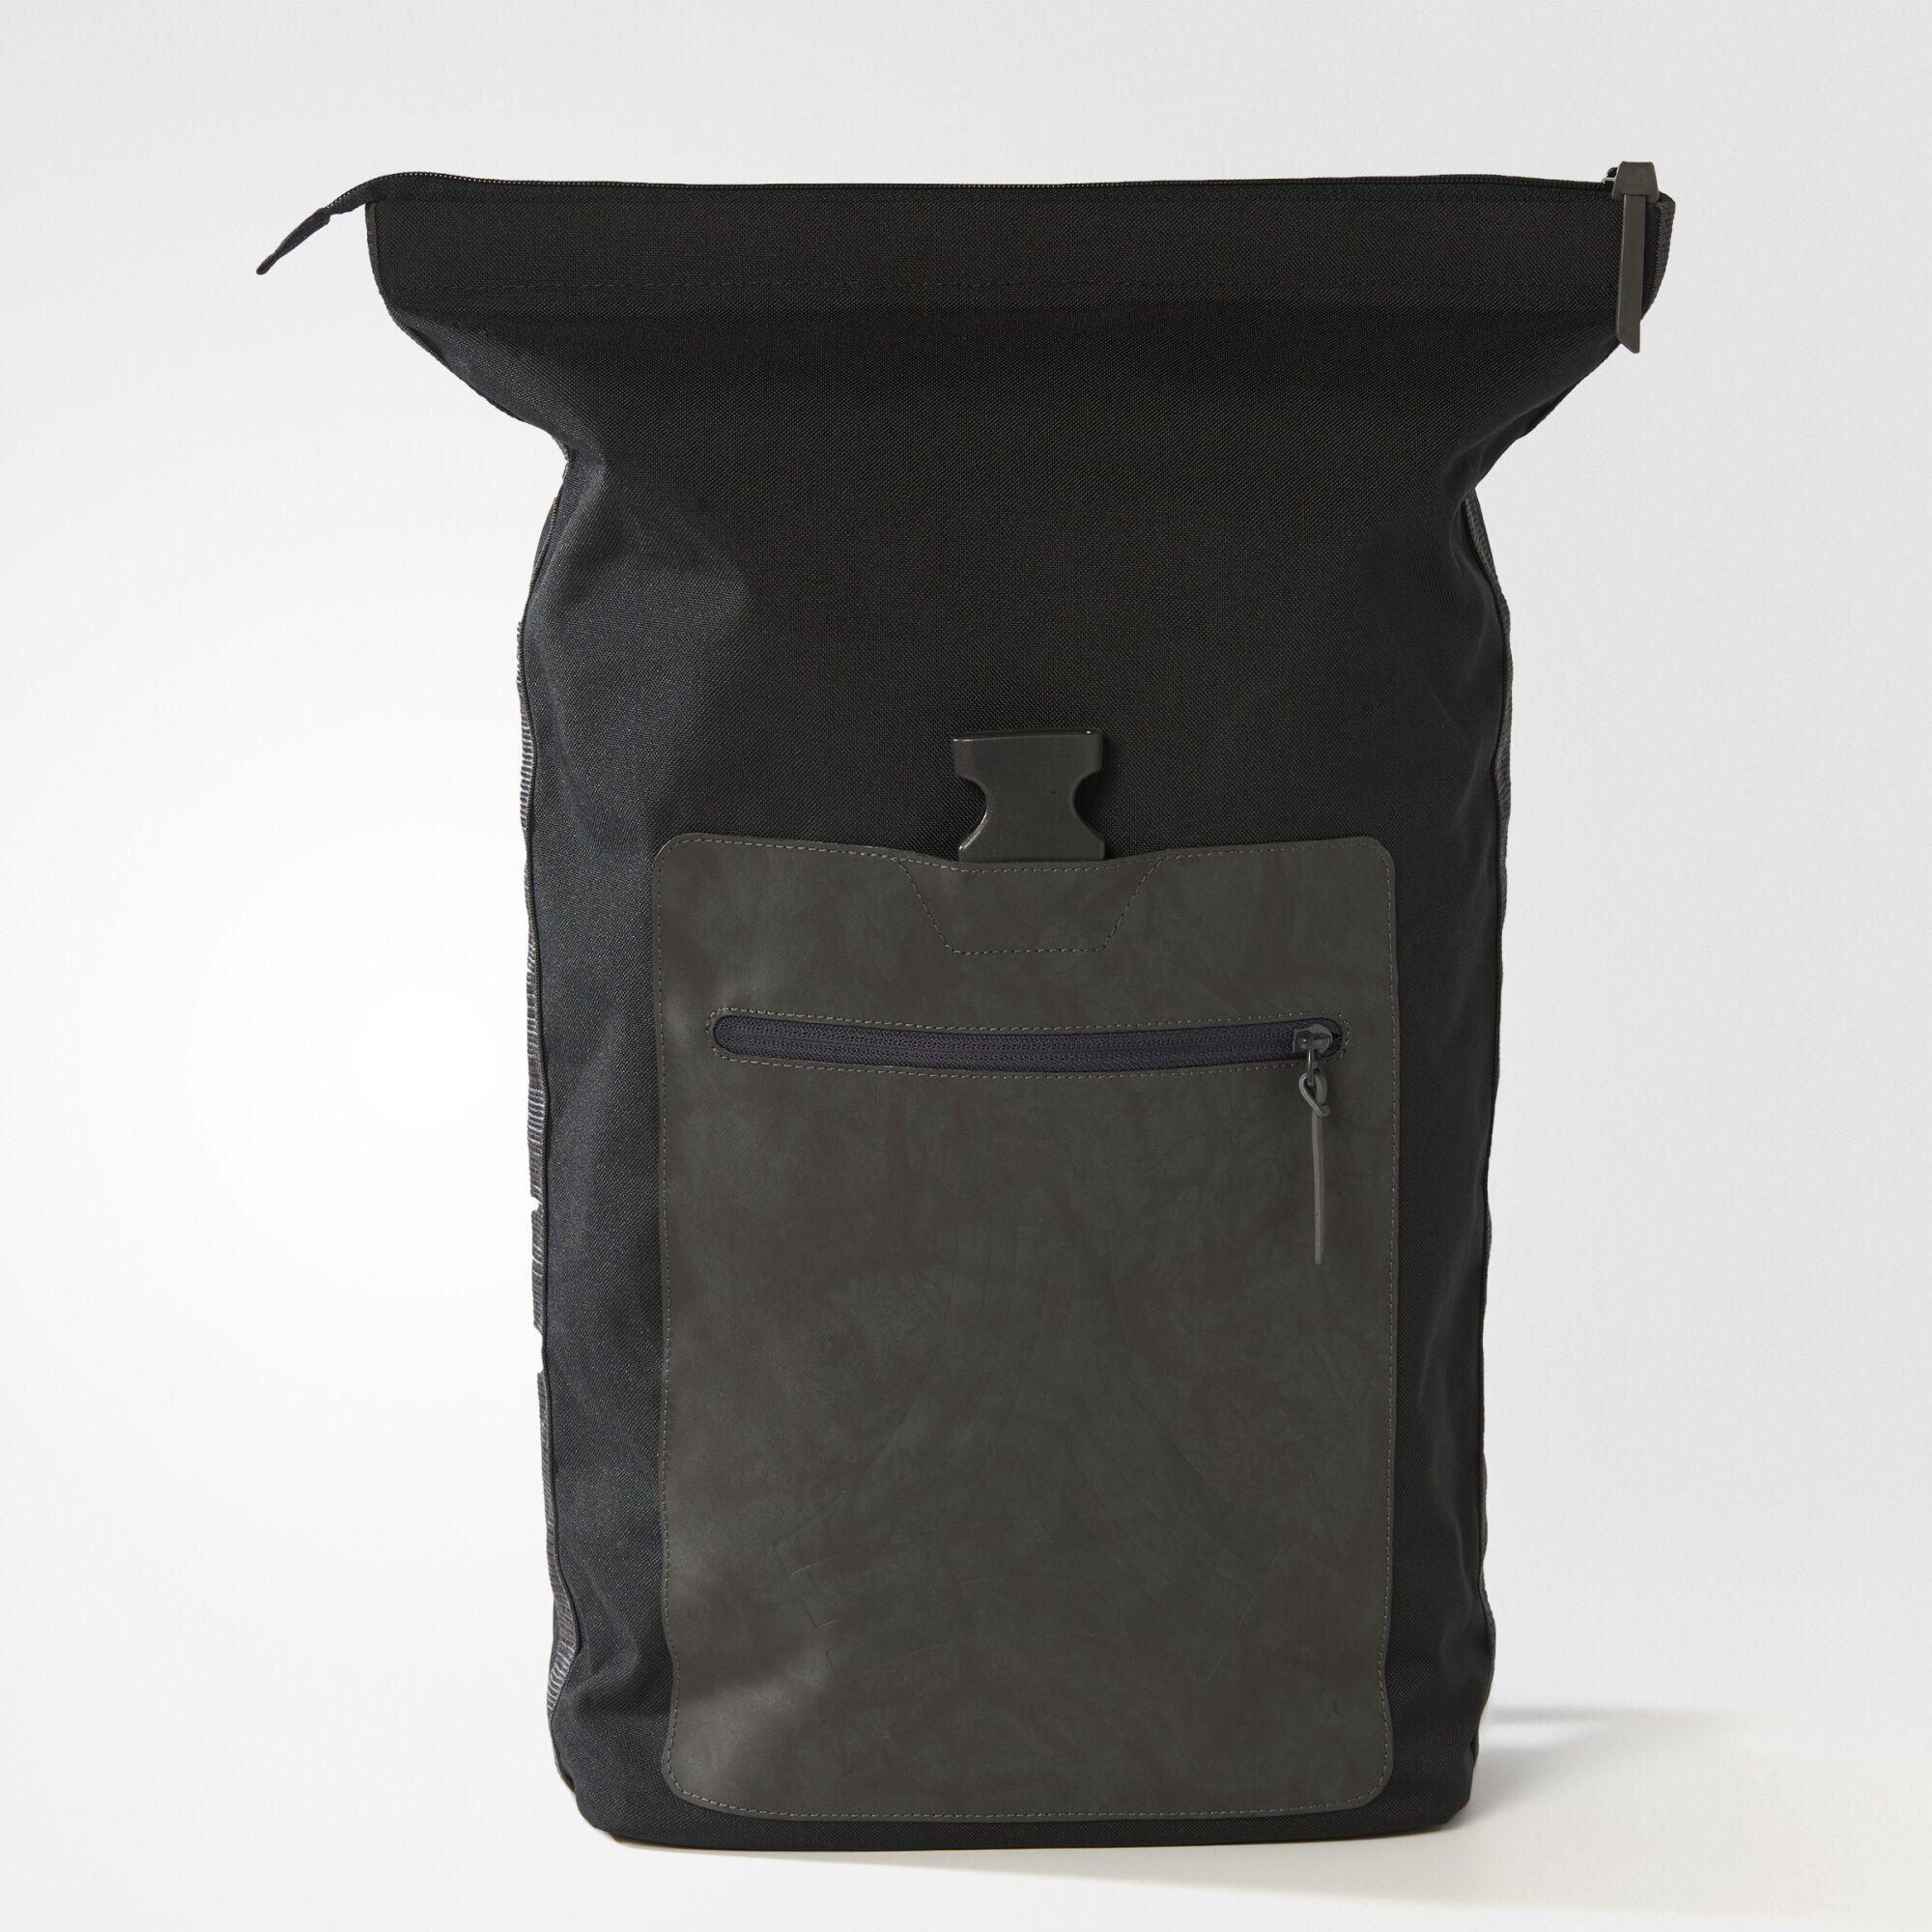 5816e5a5ab adidas duffle bag cheap   OFF45% The Largest Catalog Discounts